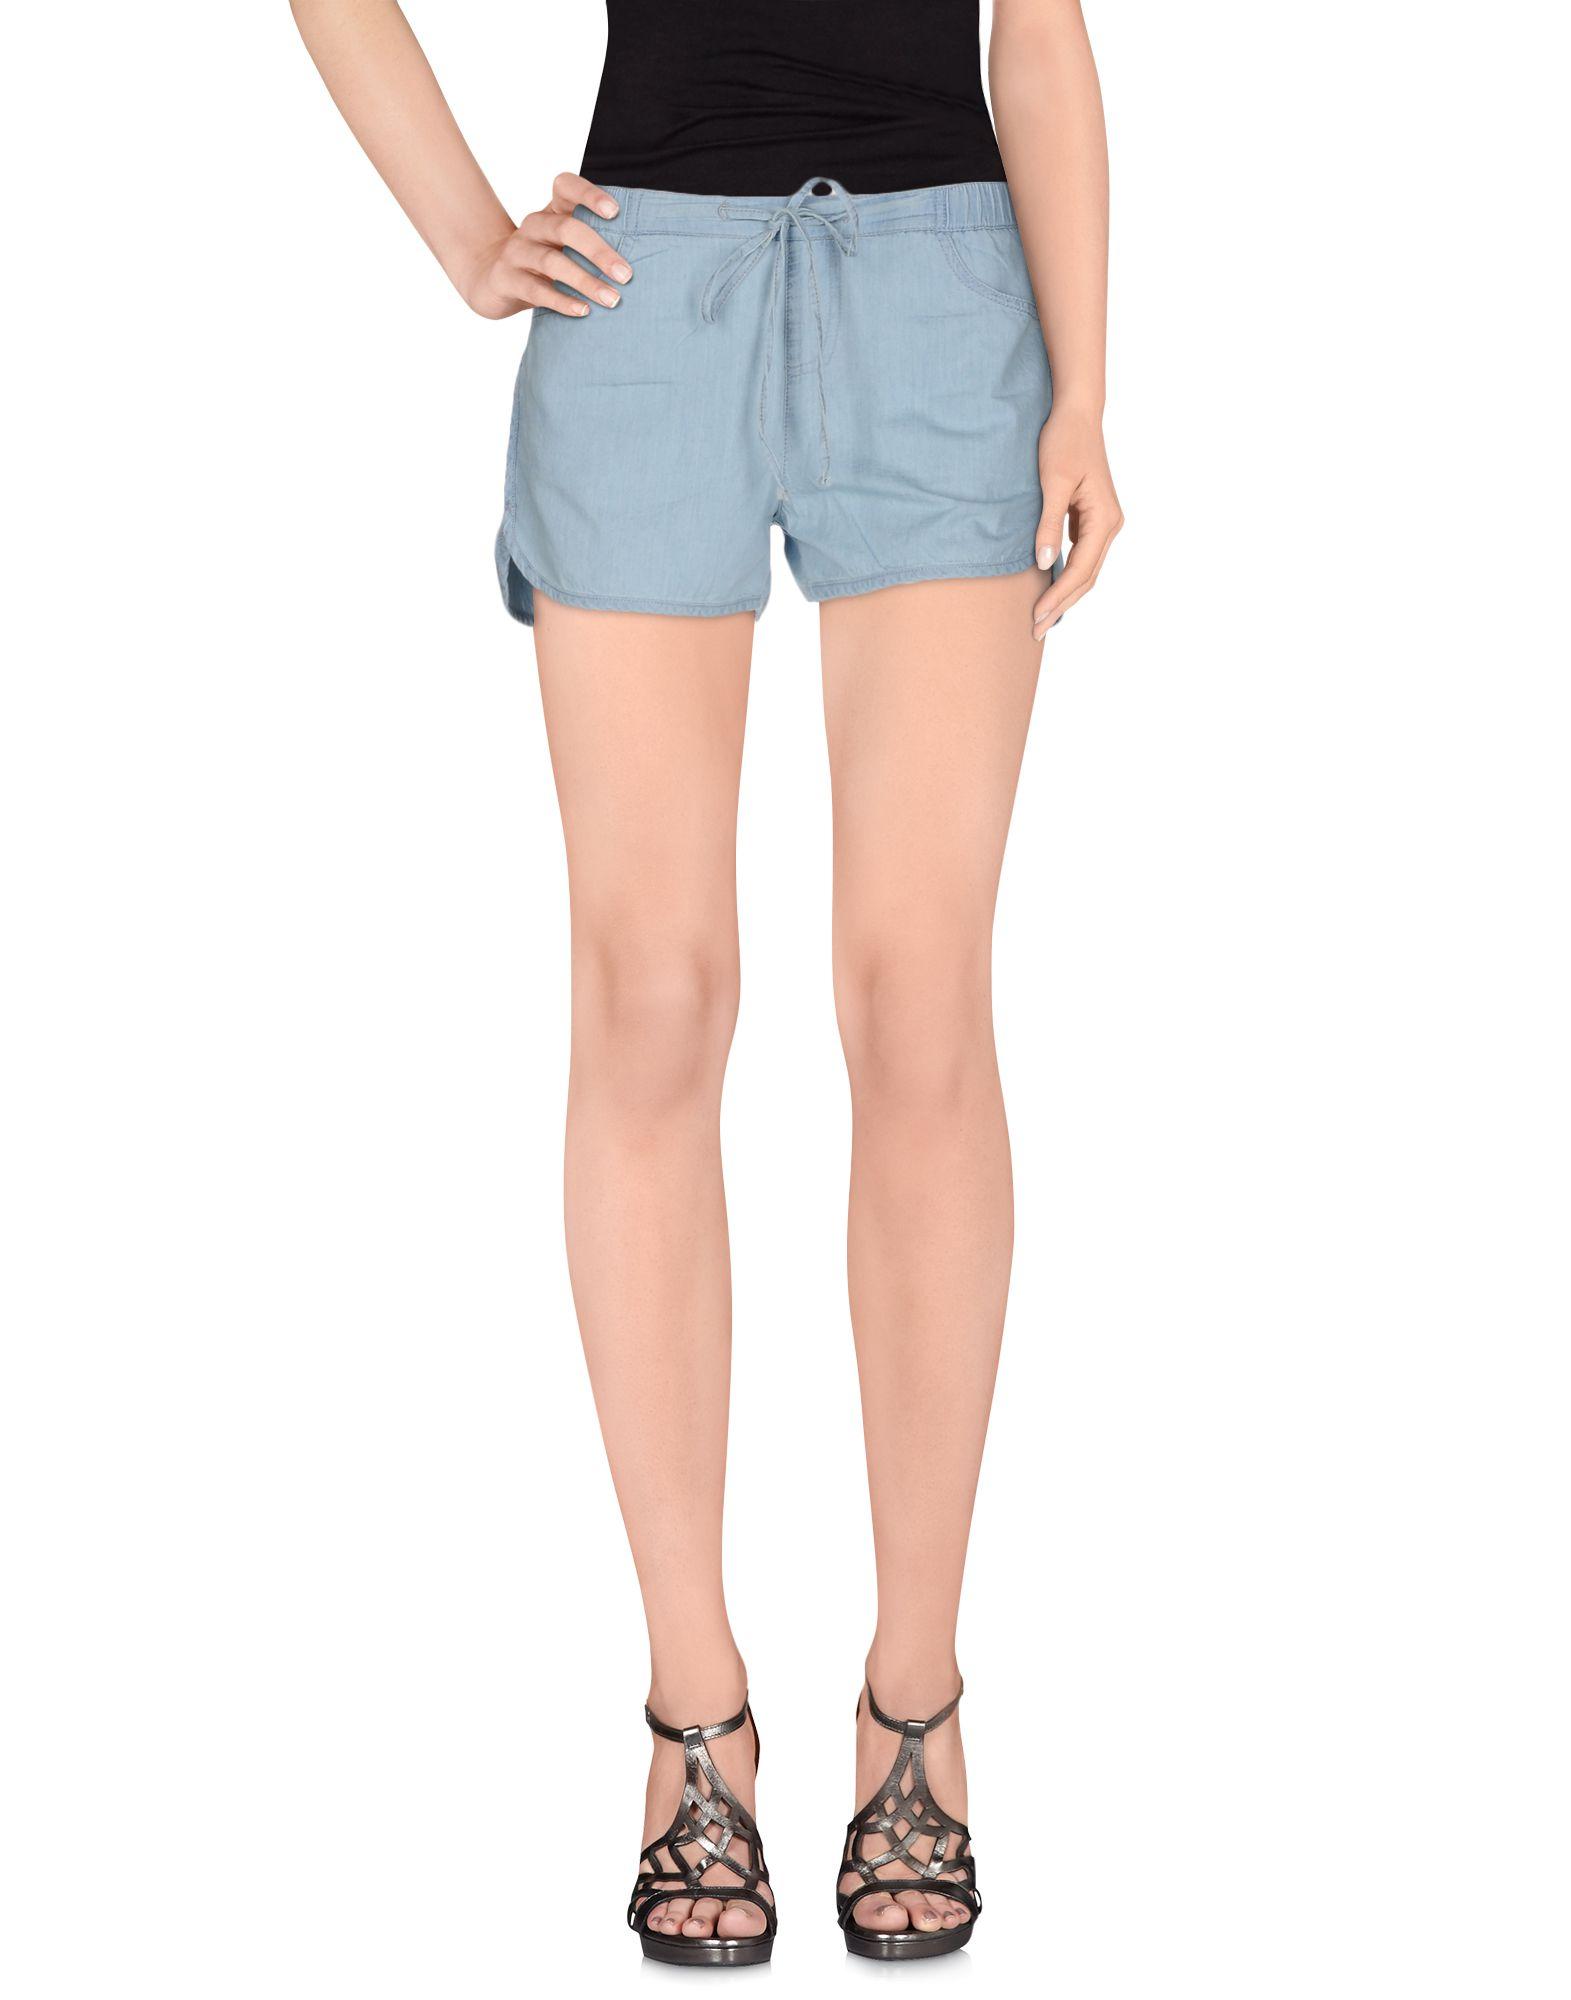 SPARKZ Джинсовые шорты superfine джинсовые шорты